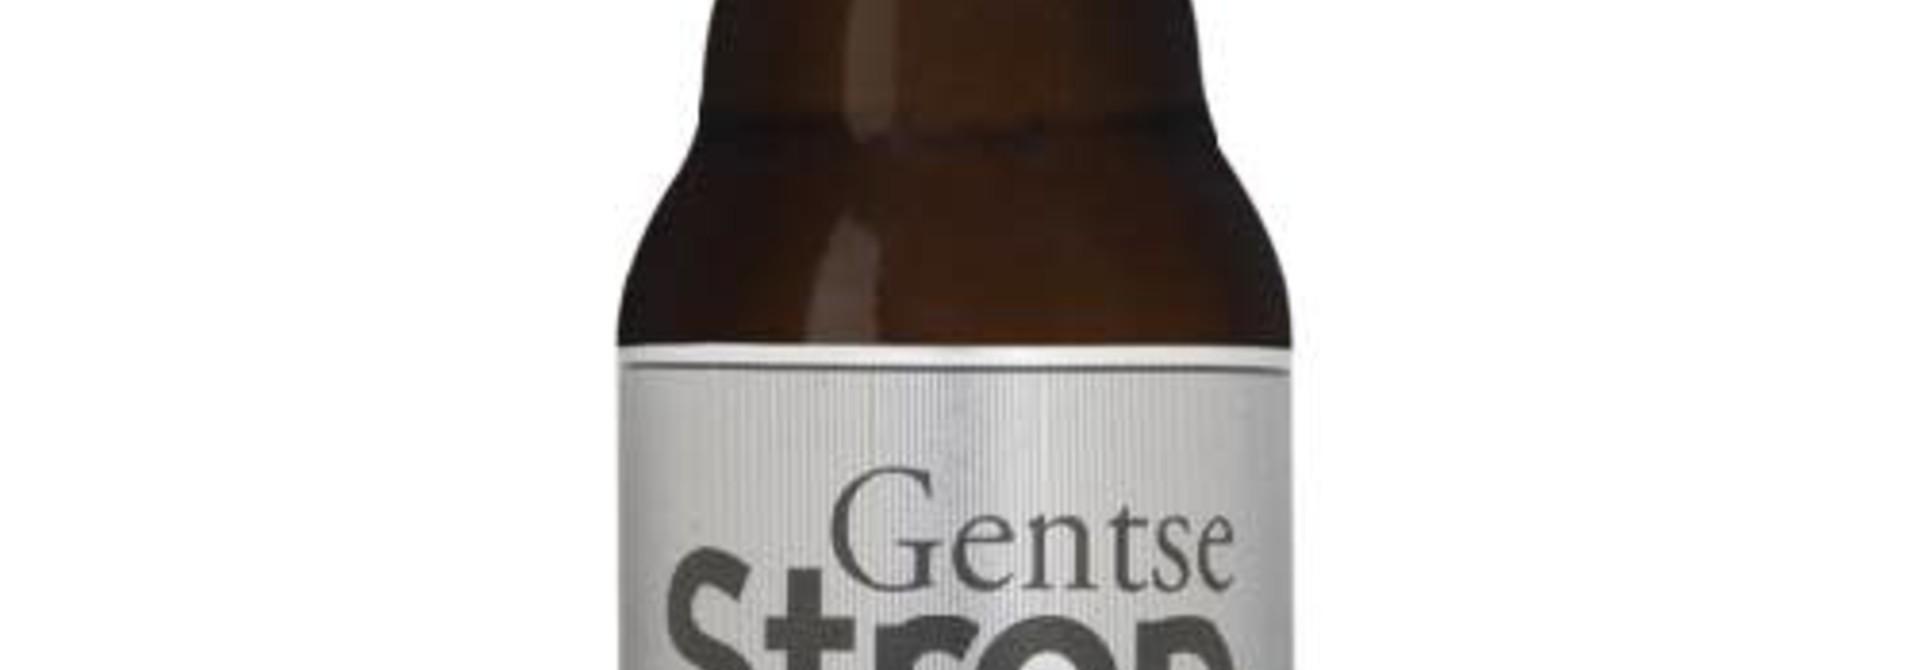 GENTSE STROP 33CL